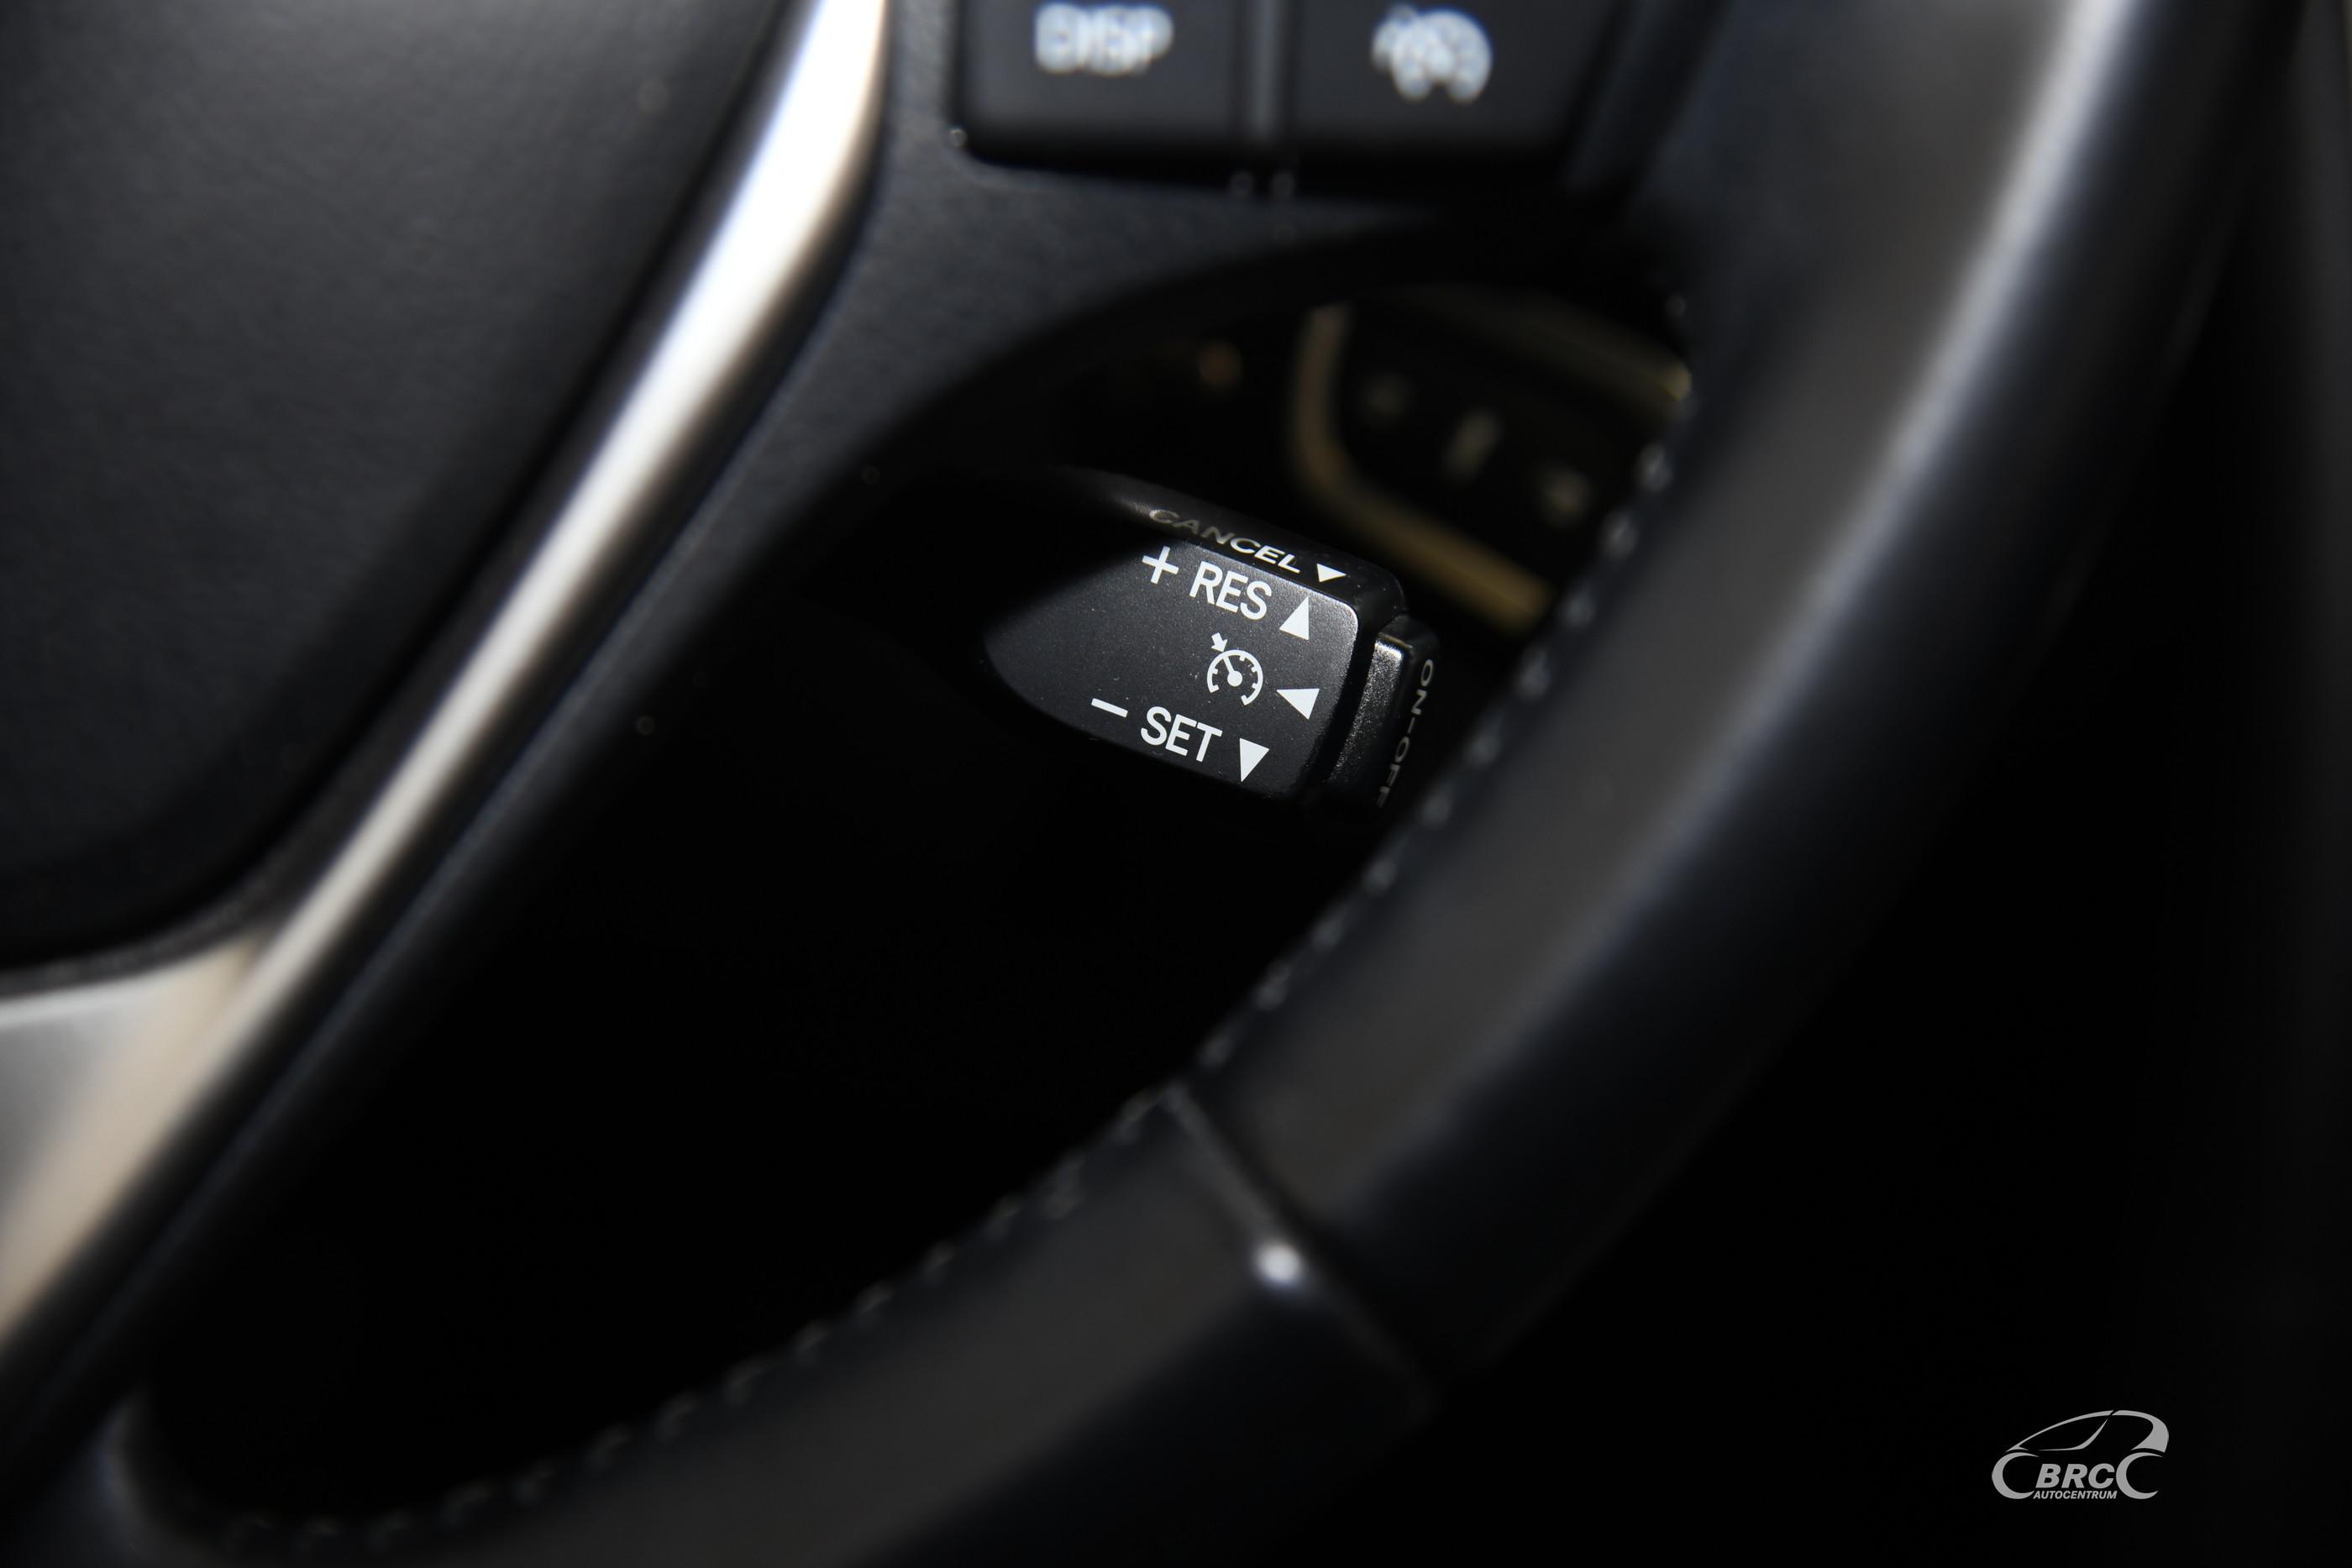 Toyota Auris 1.6 VVT-i Touring Sports Active Plus